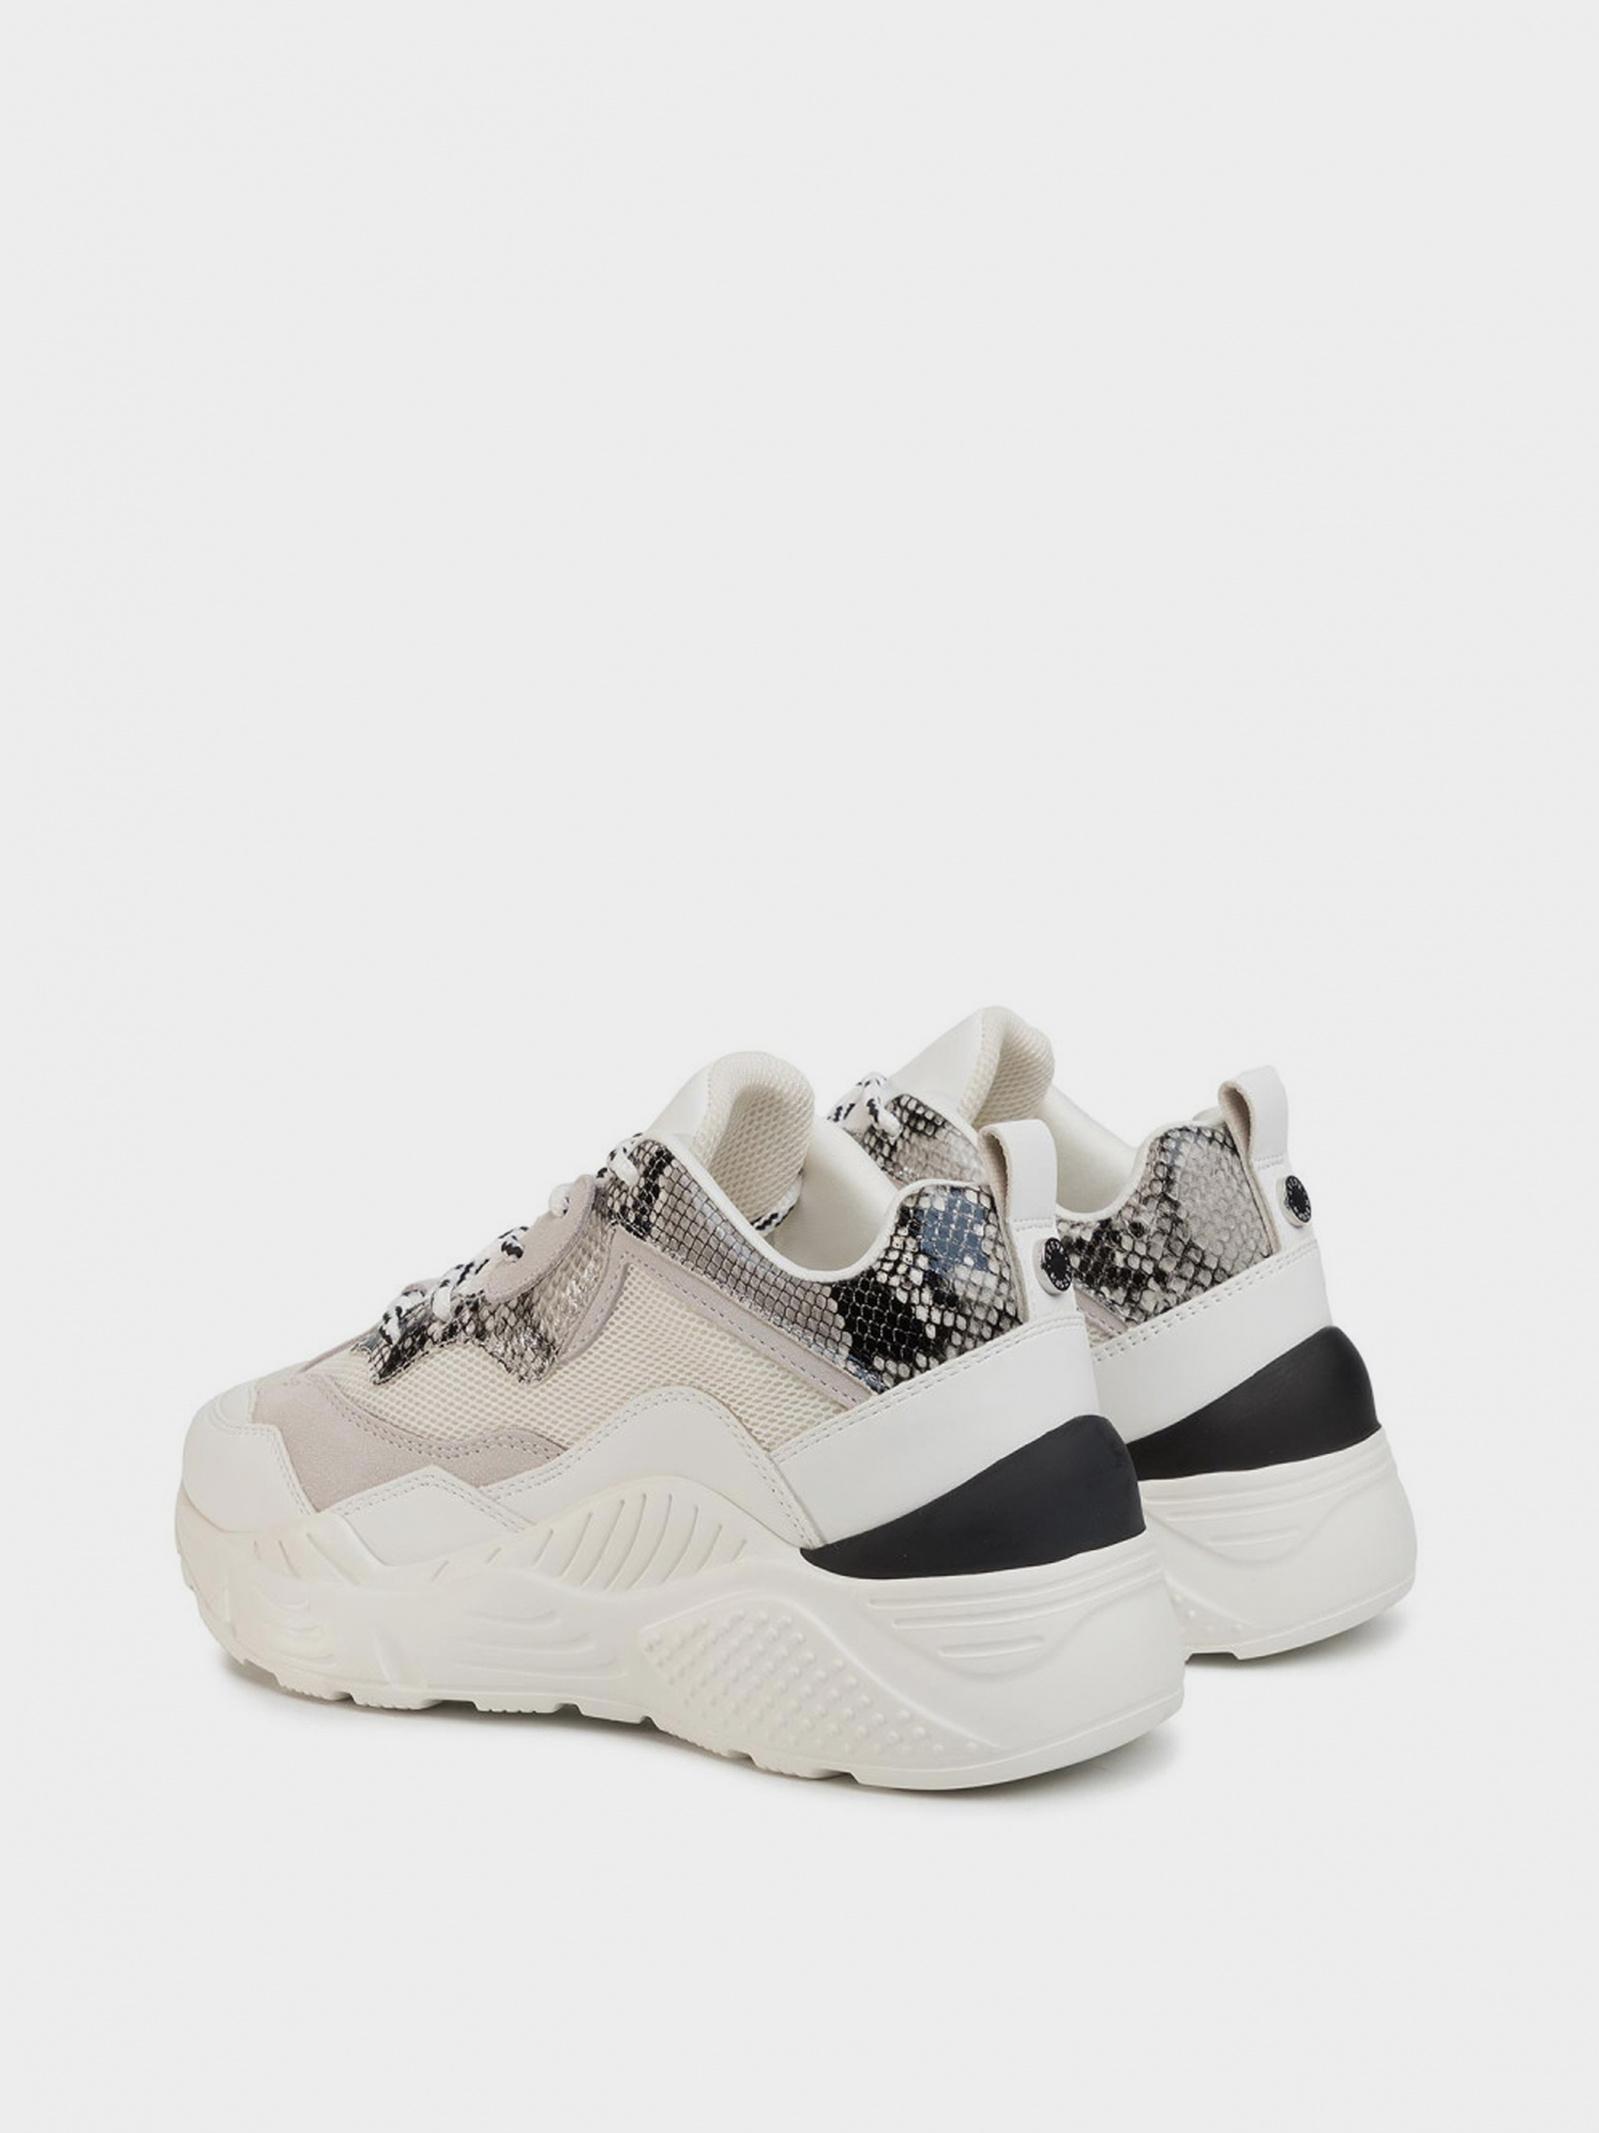 Кросівки  жіночі Steve Madden ANTONIA SM11000745 WHITE MULTI брендове взуття, 2017